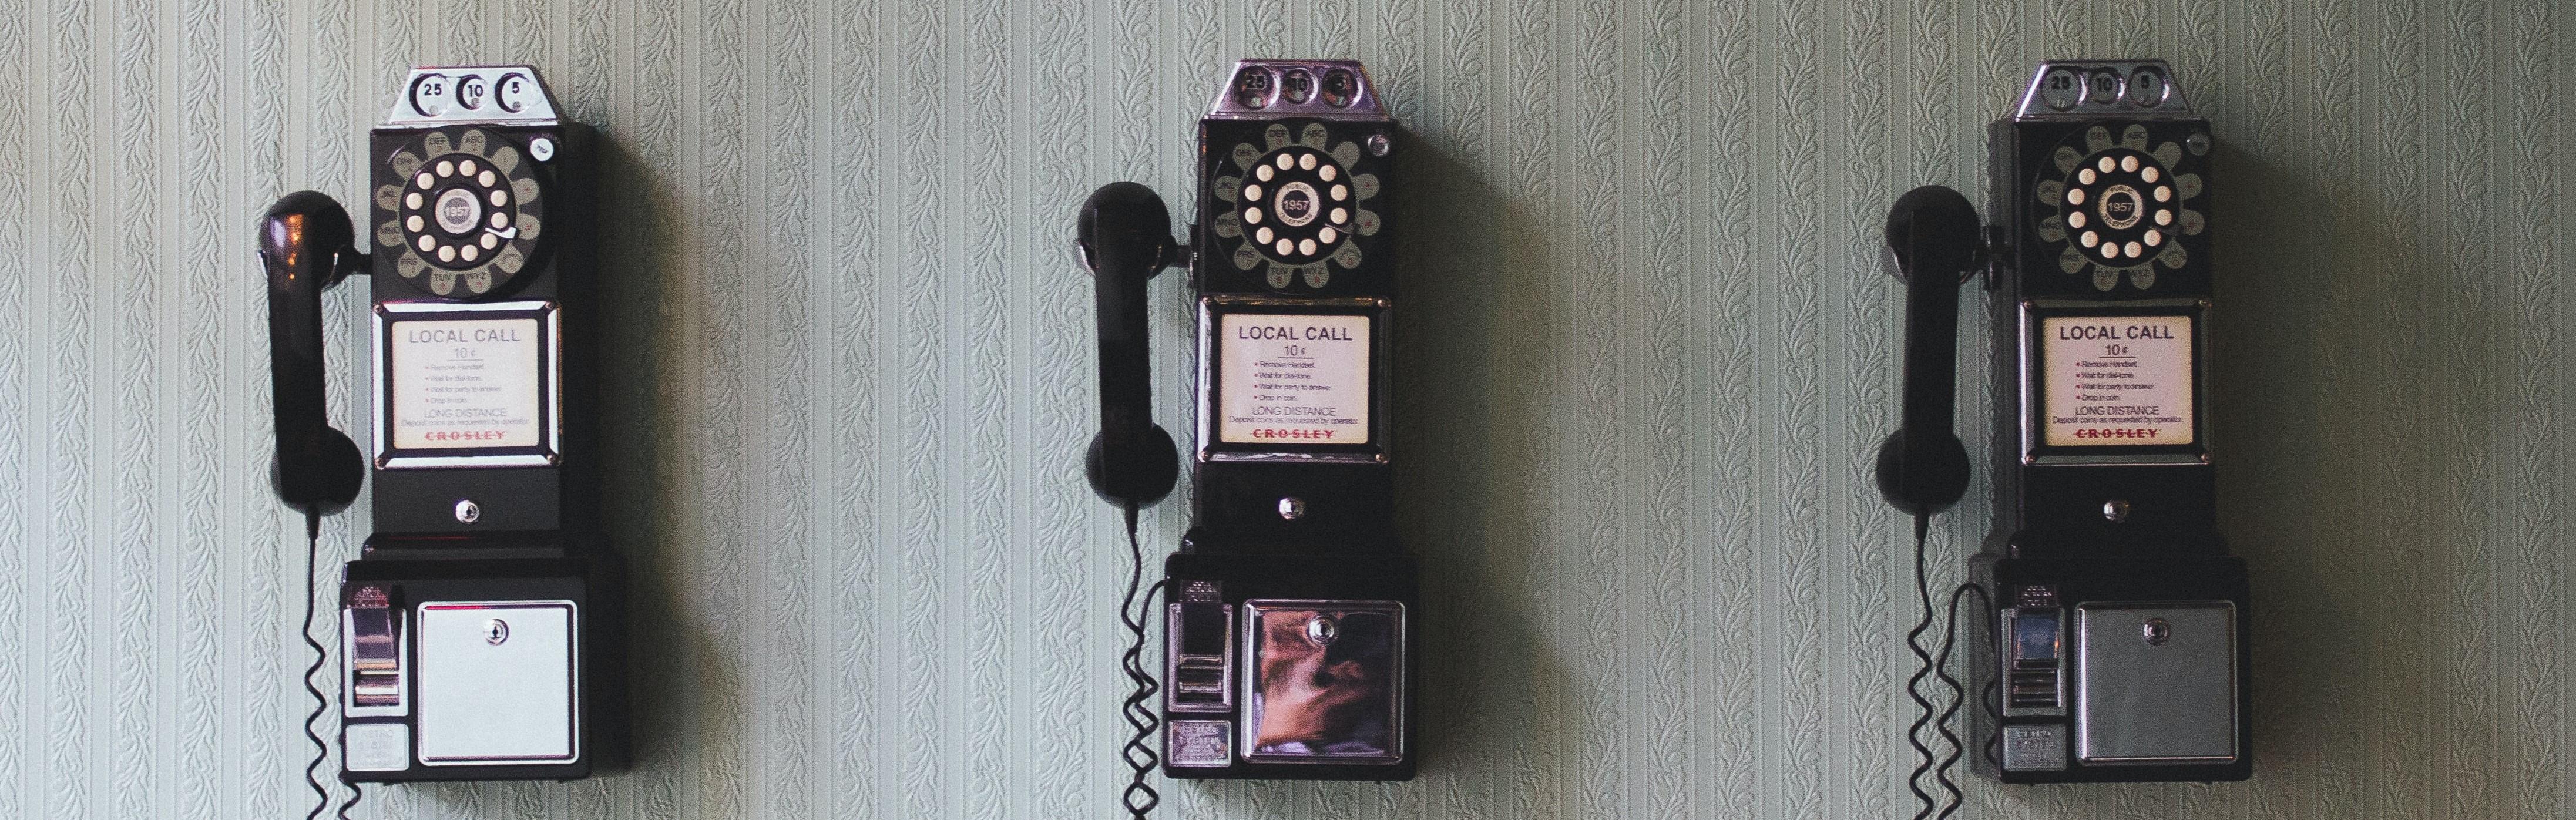 Row of old telephones